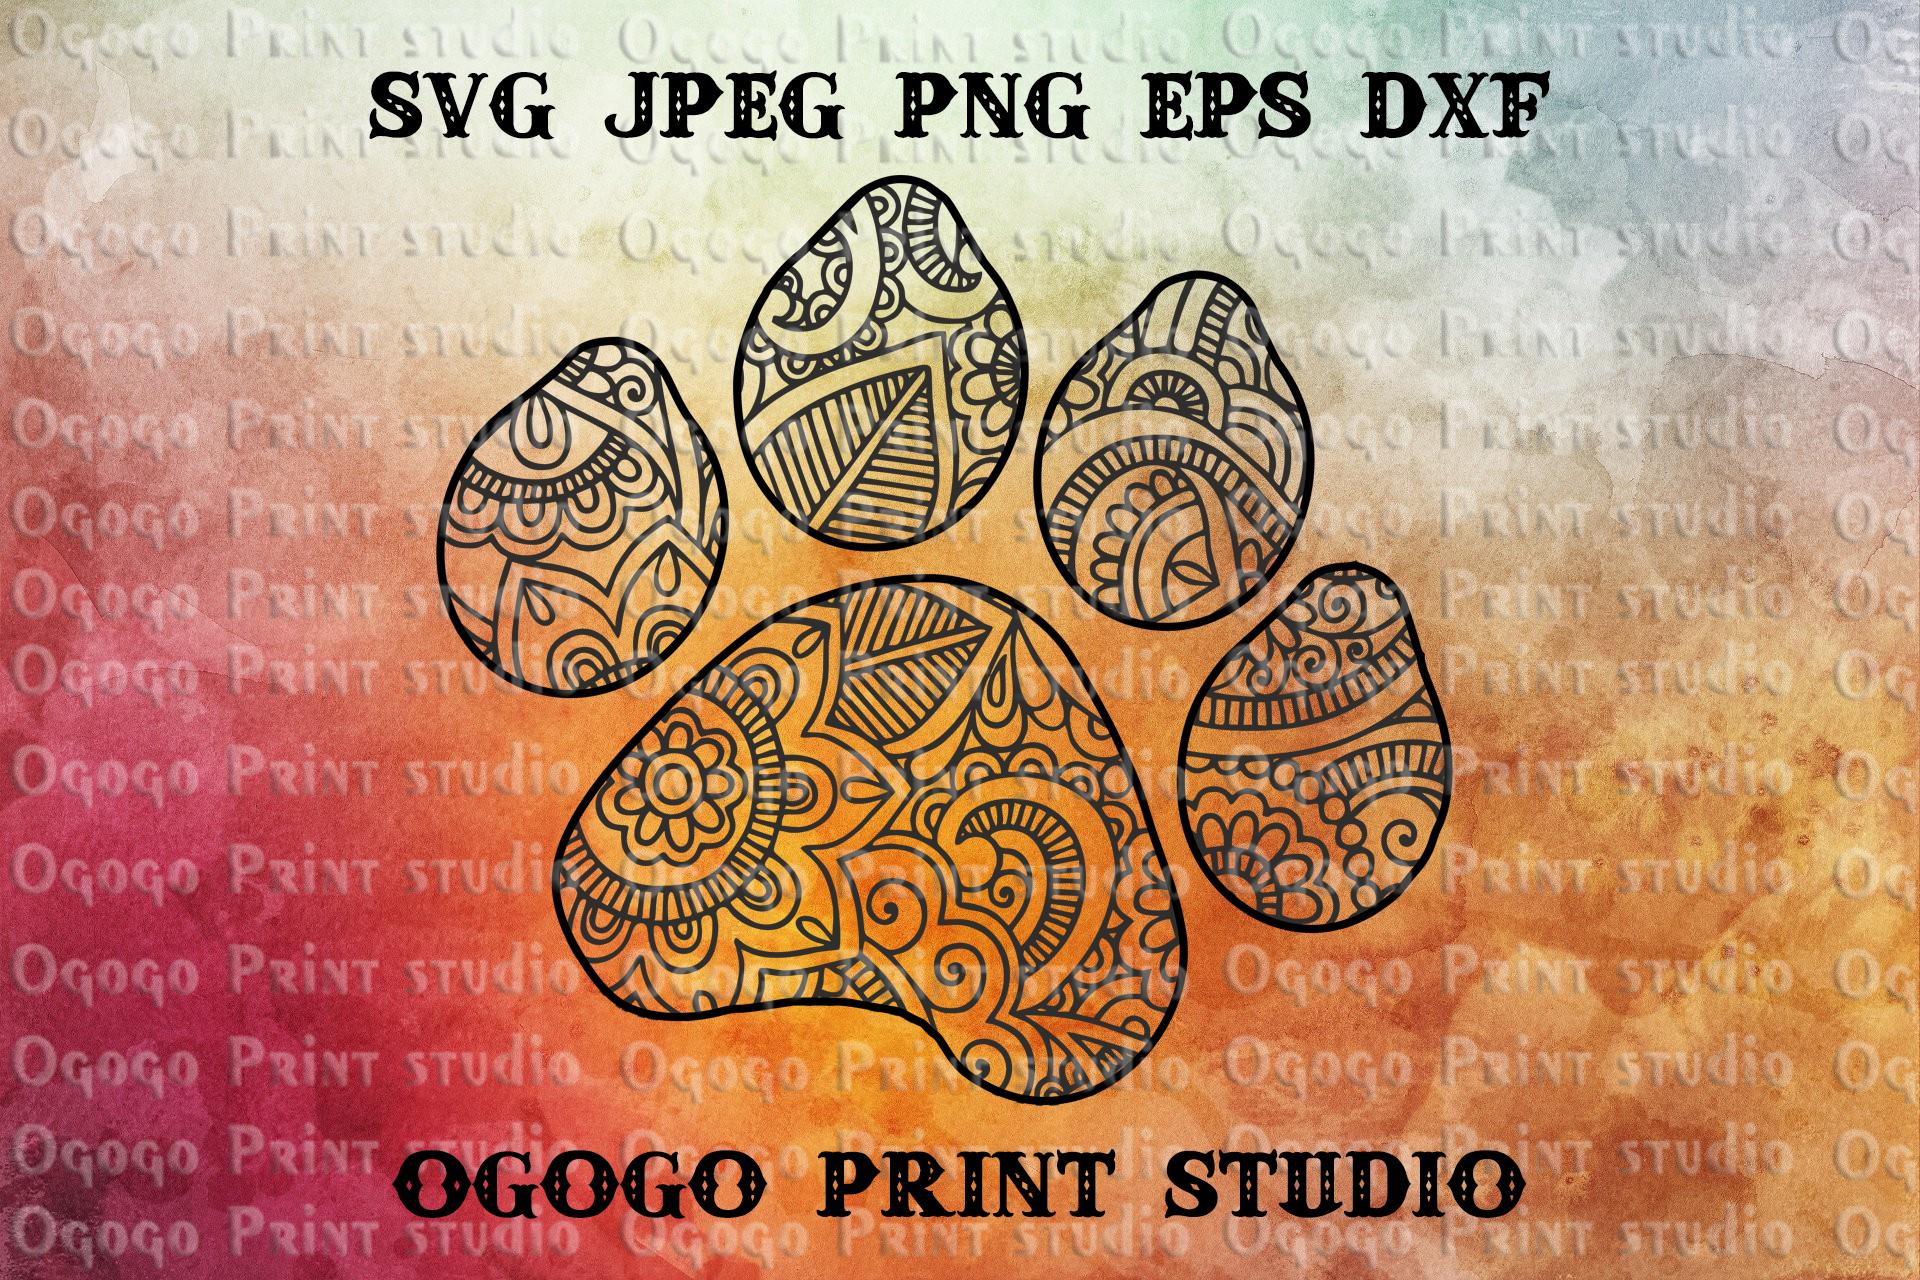 Mandala svg, Dog paw svg, Zentangle SVG, Paw svg,PAW Patrol example image 1